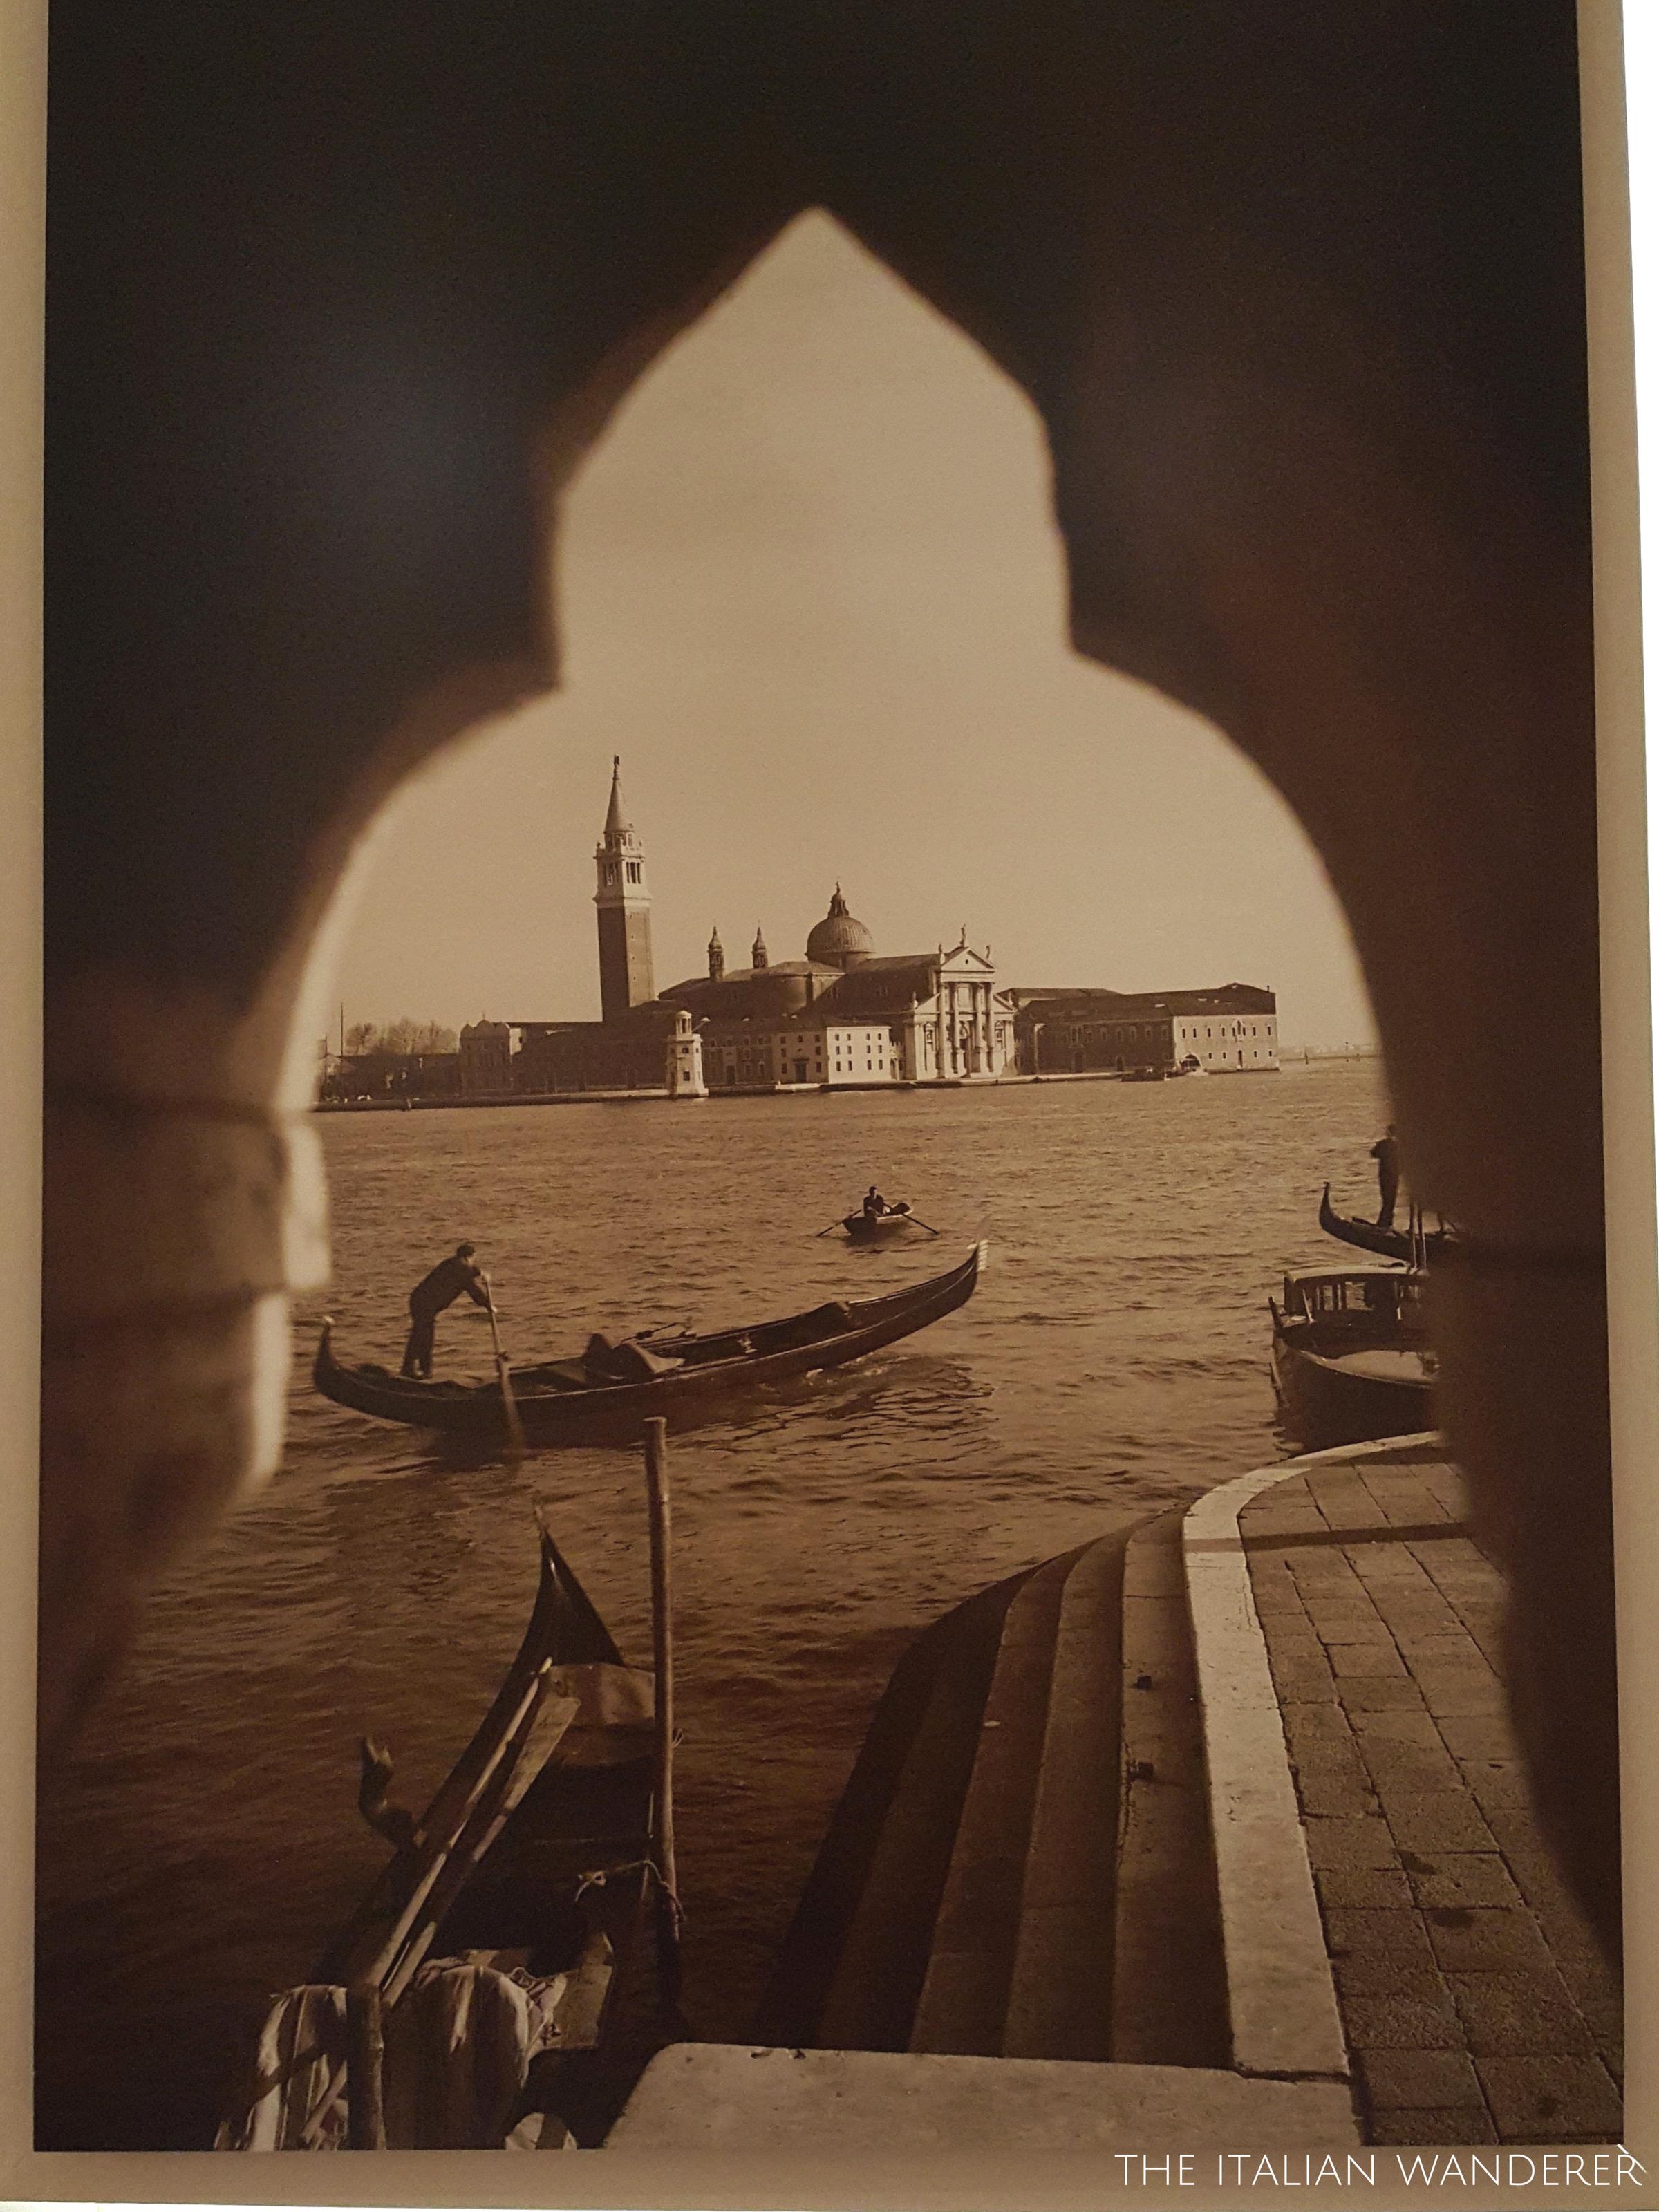 Nh Palazzo Barocci, #Venice